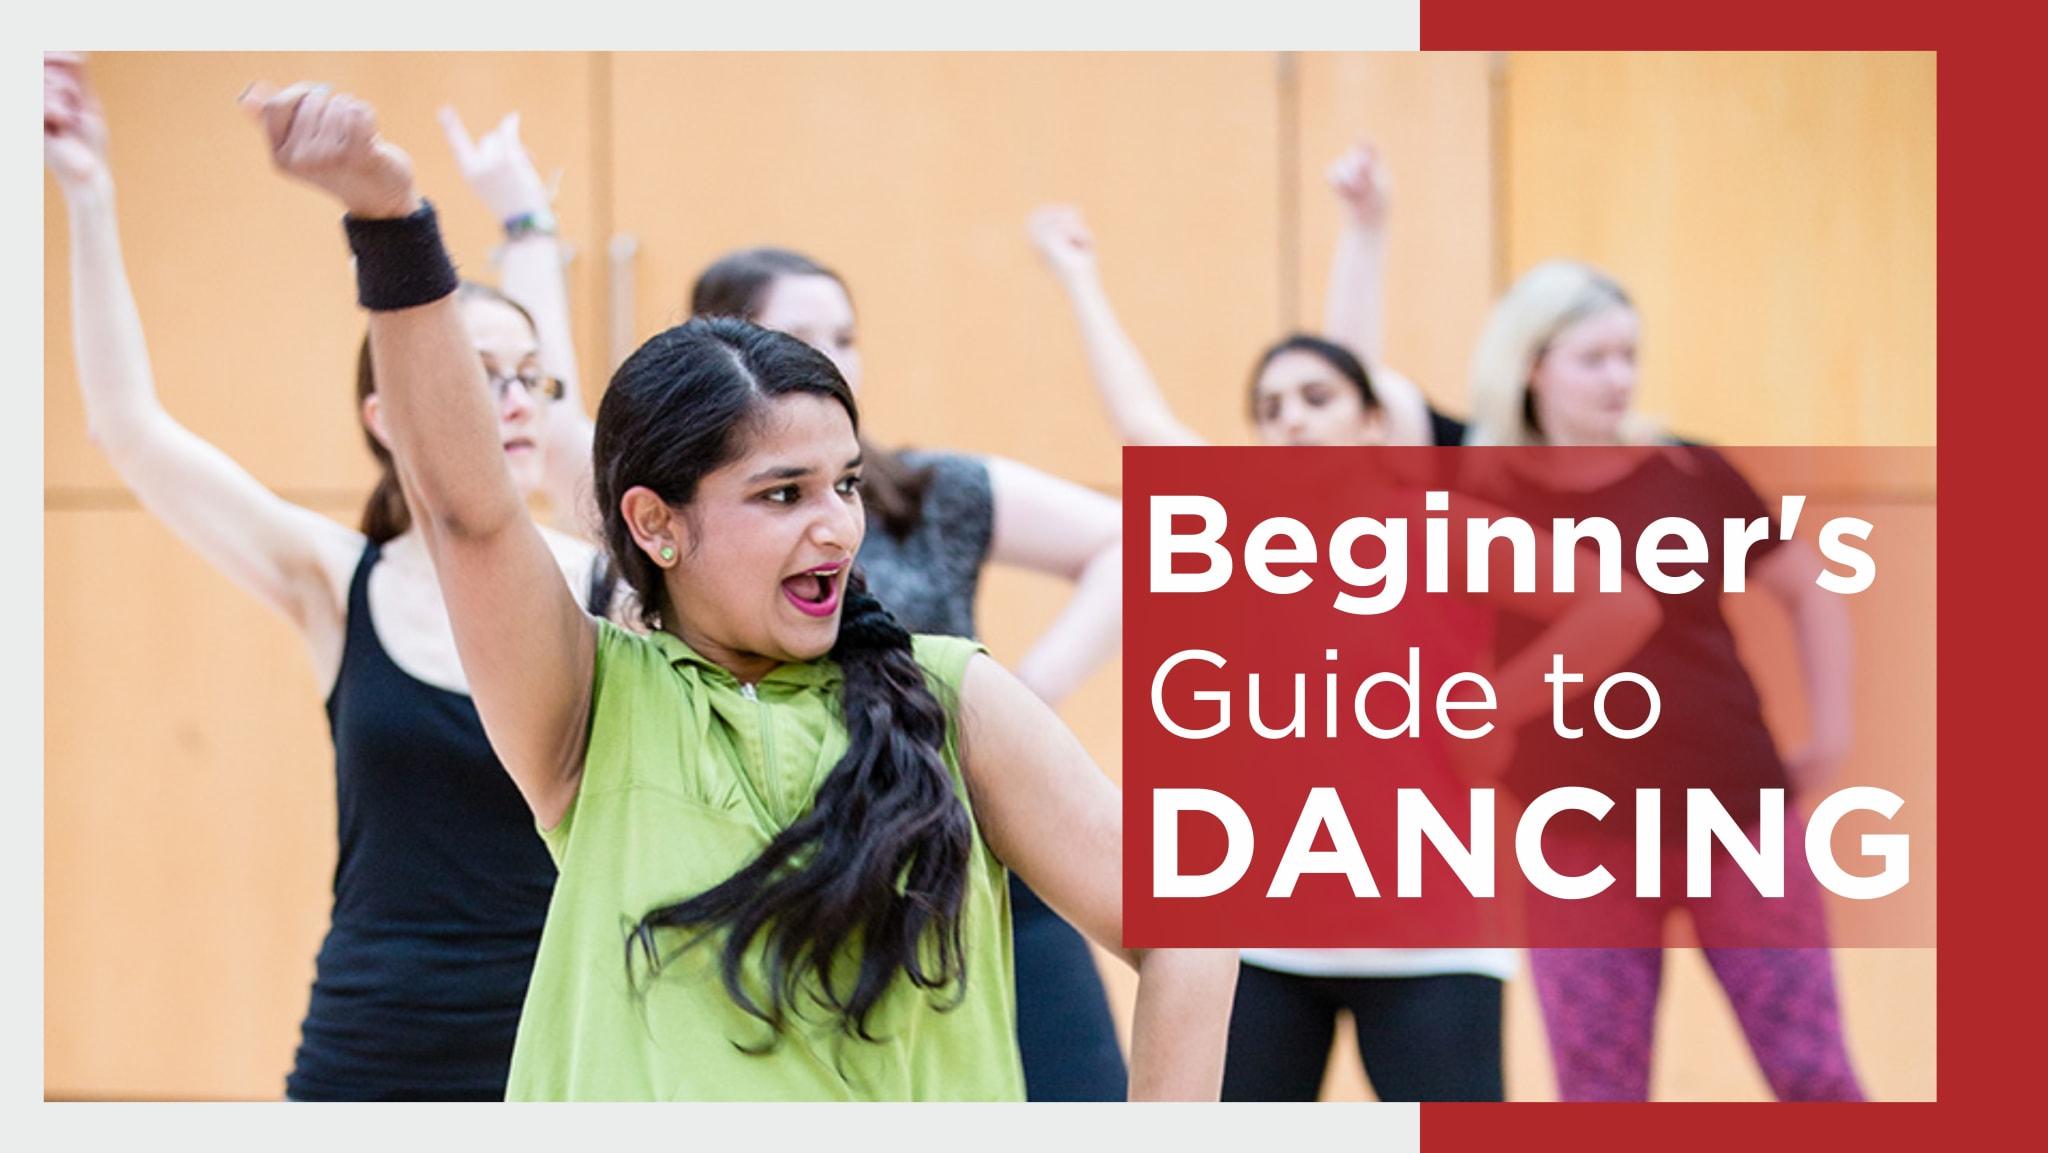 beginner's guide to dancing, dance for beginners, beginners dance, dance guide, guide to dancing, dance classes for beginners, easy dance steps, hip hop dance, bollywood dance, bollyhop dance, beginners guide to dancing, guide to dancing